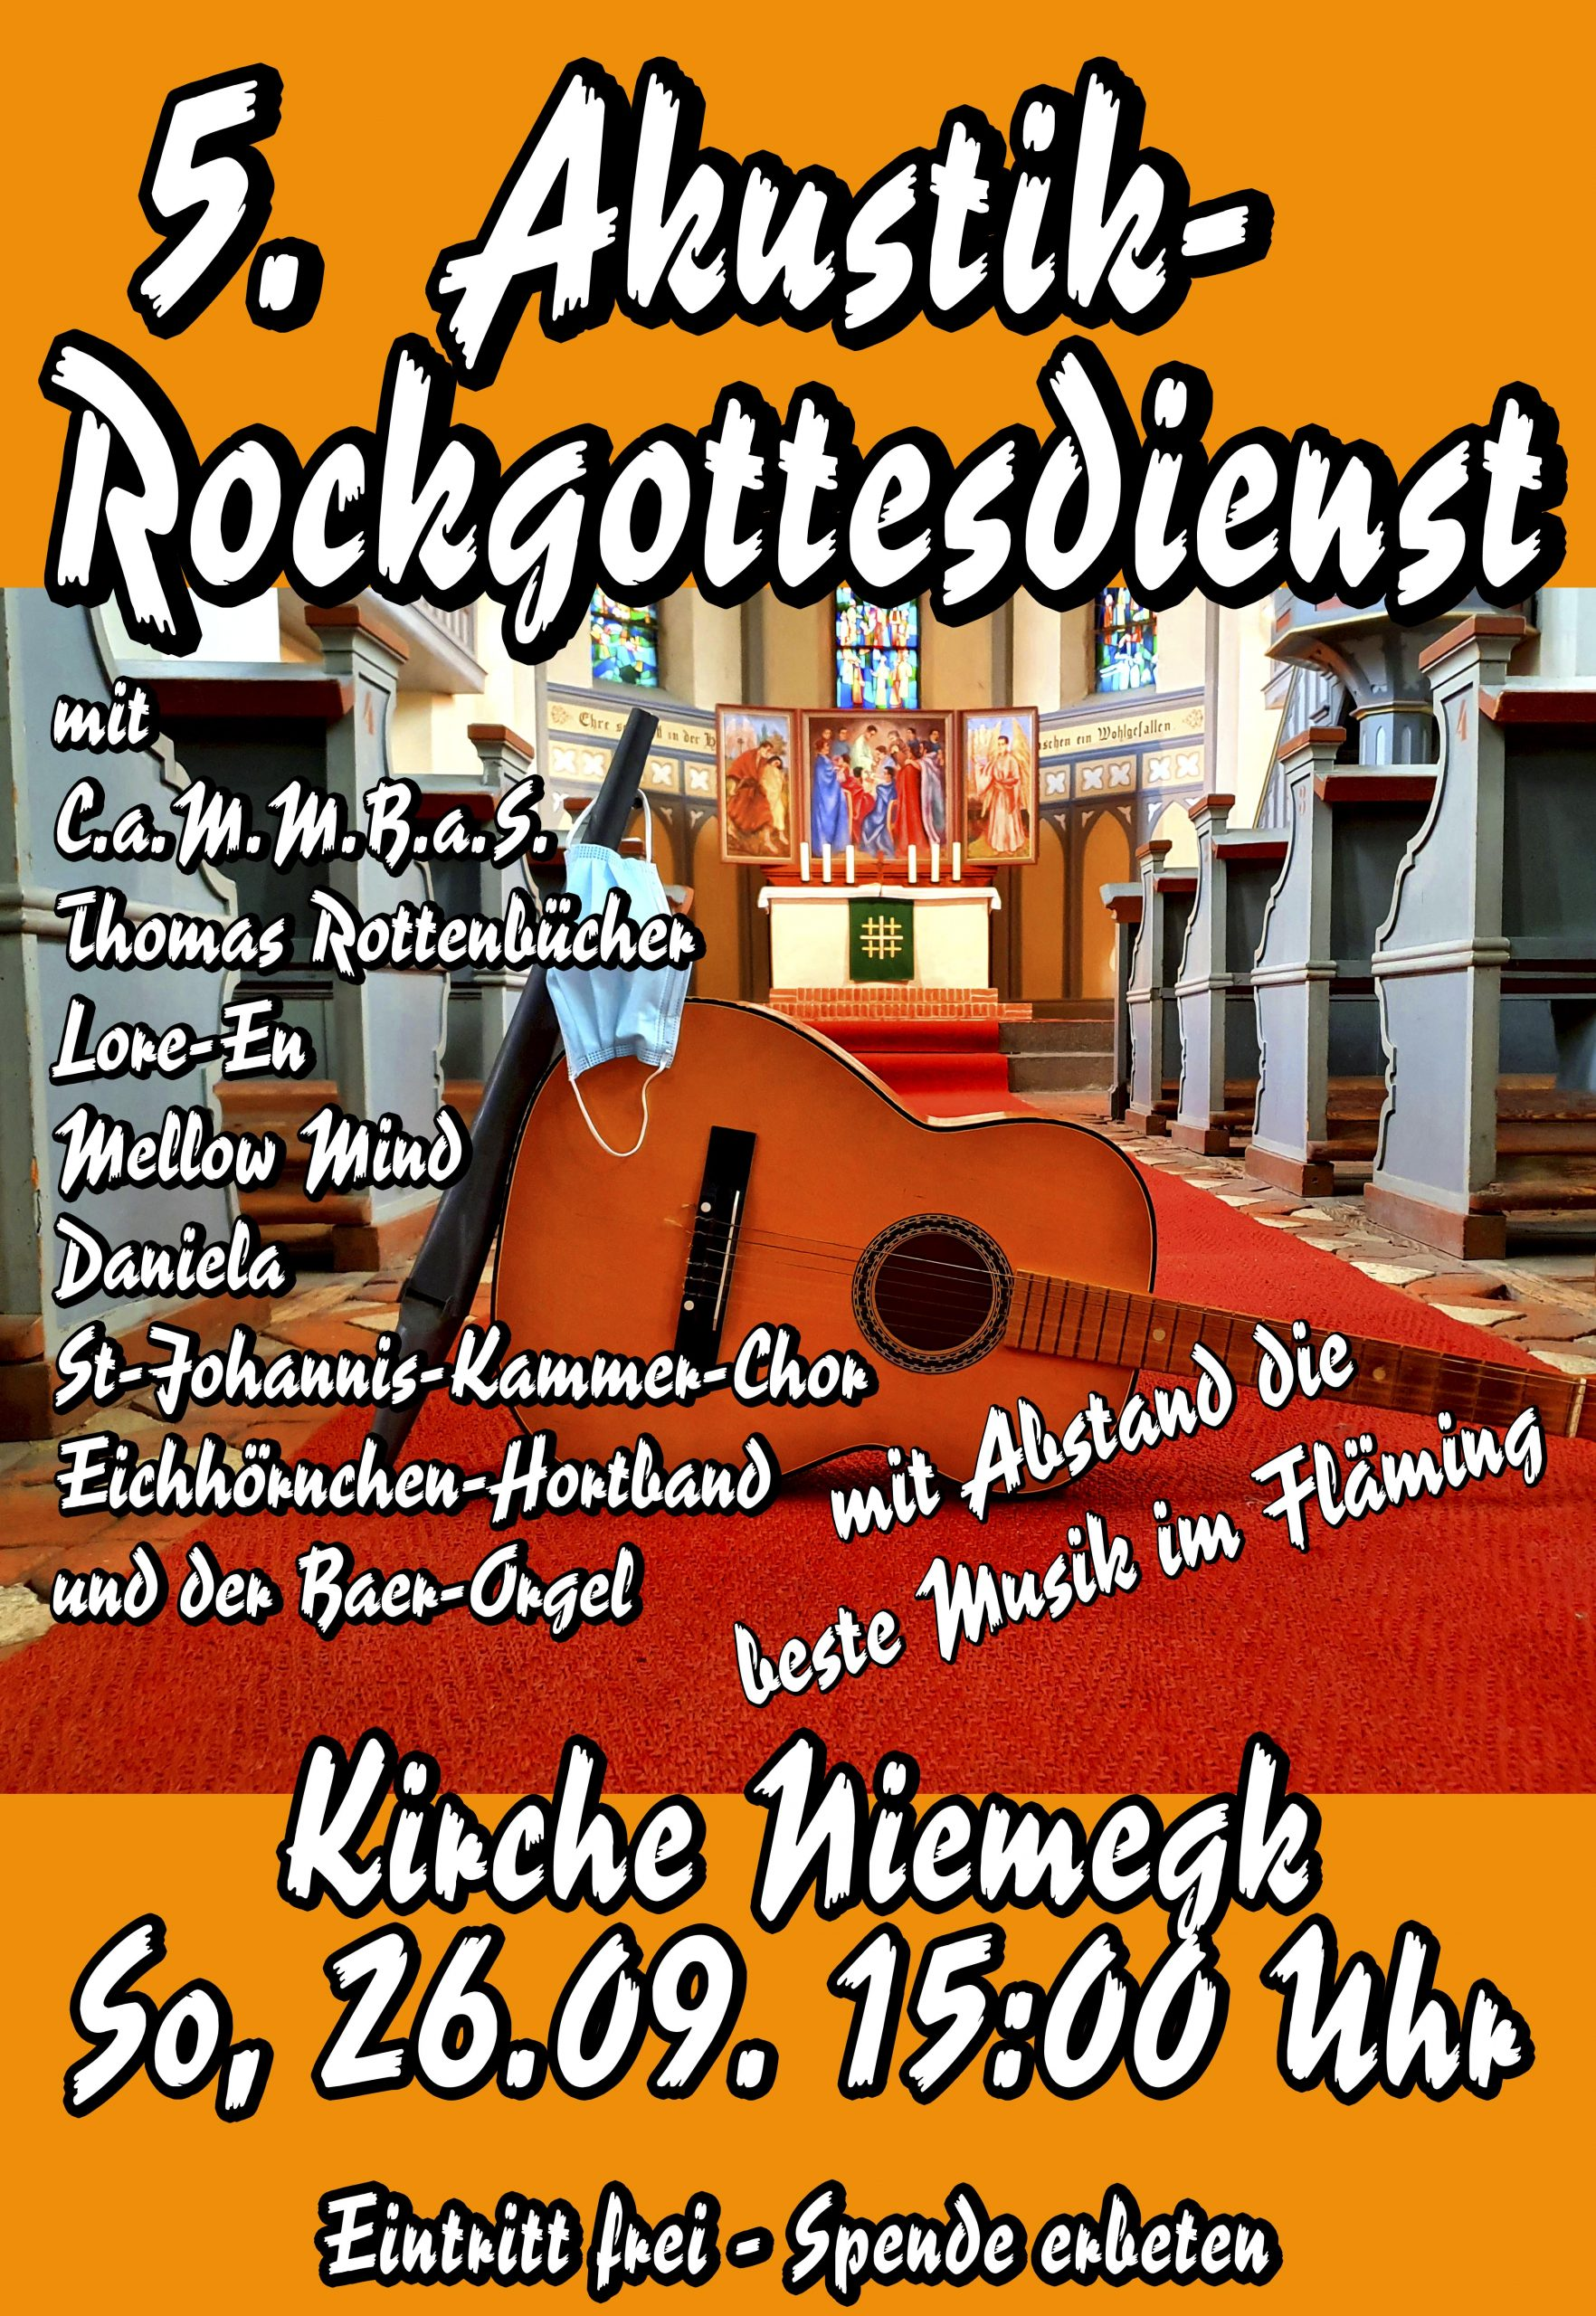 akustik-rockgottesdienst 2021 hochkant Kopie